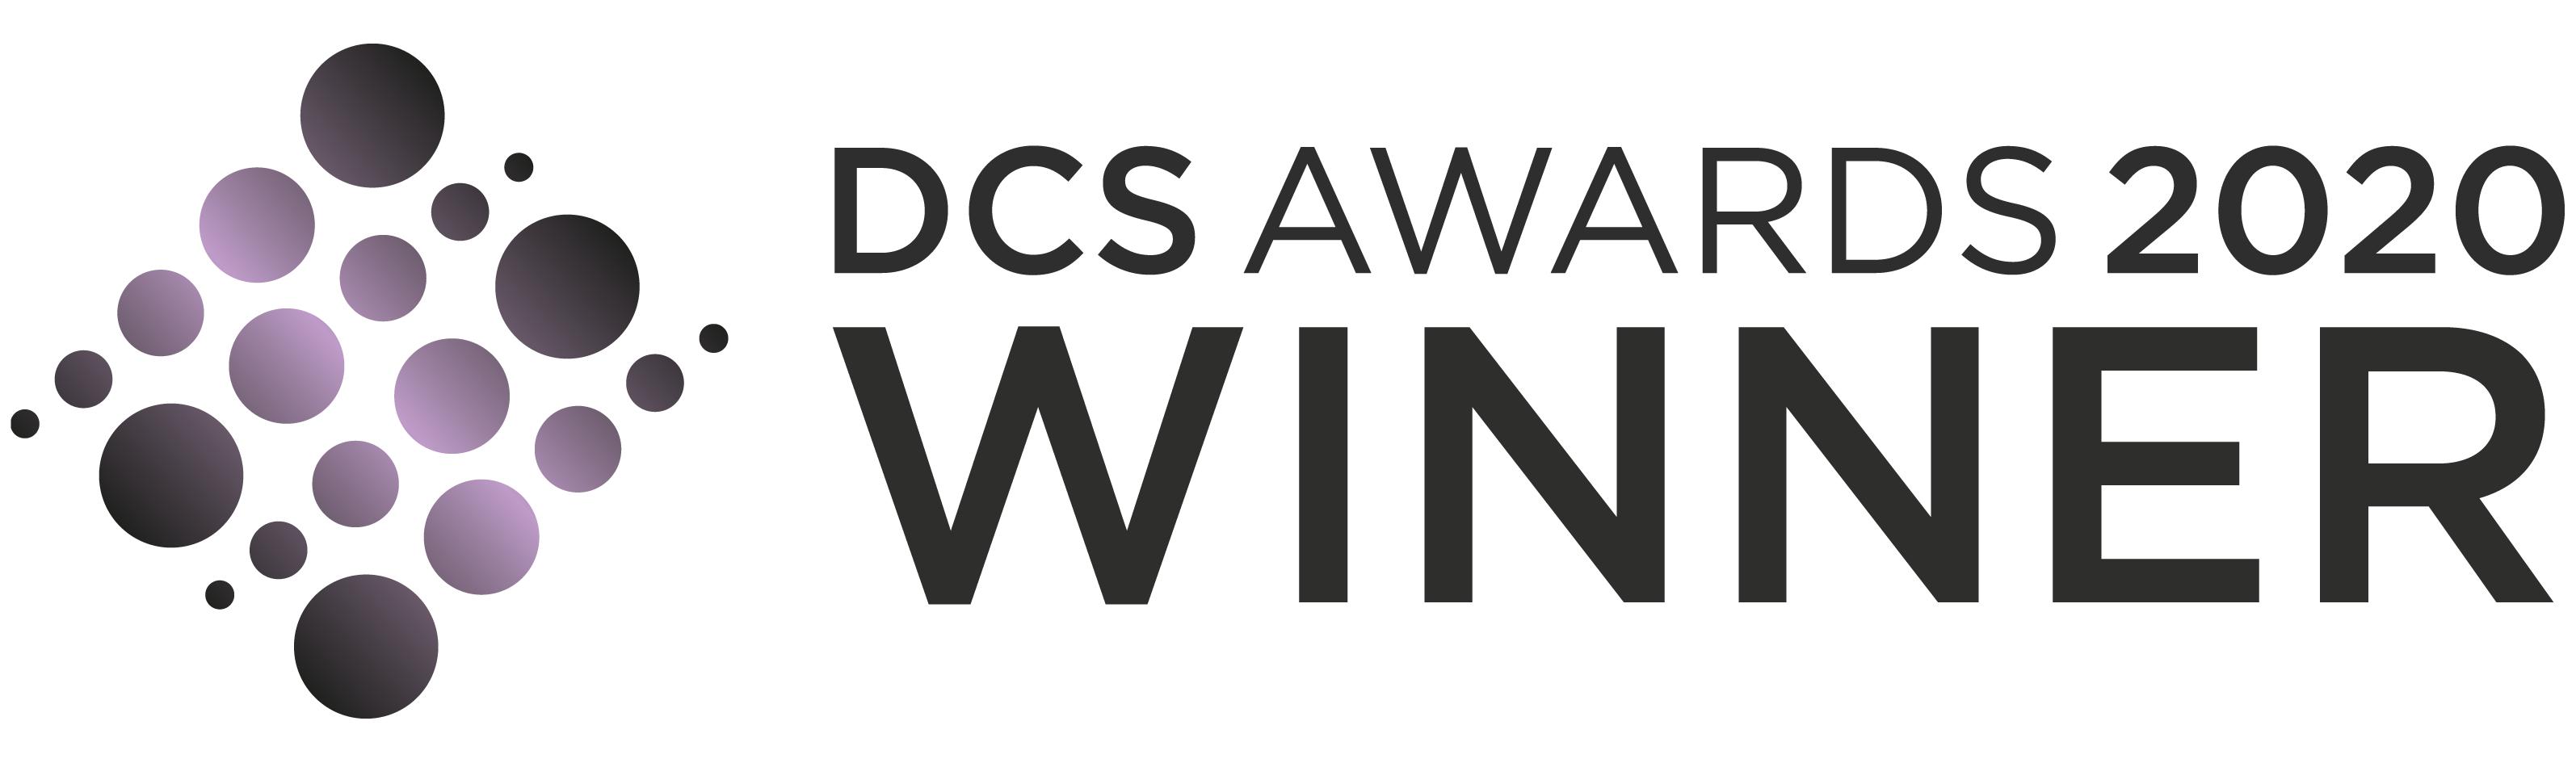 Teledata wins Data Centre Energy Efficiency Project of the Year at Prestigious DCS Awards